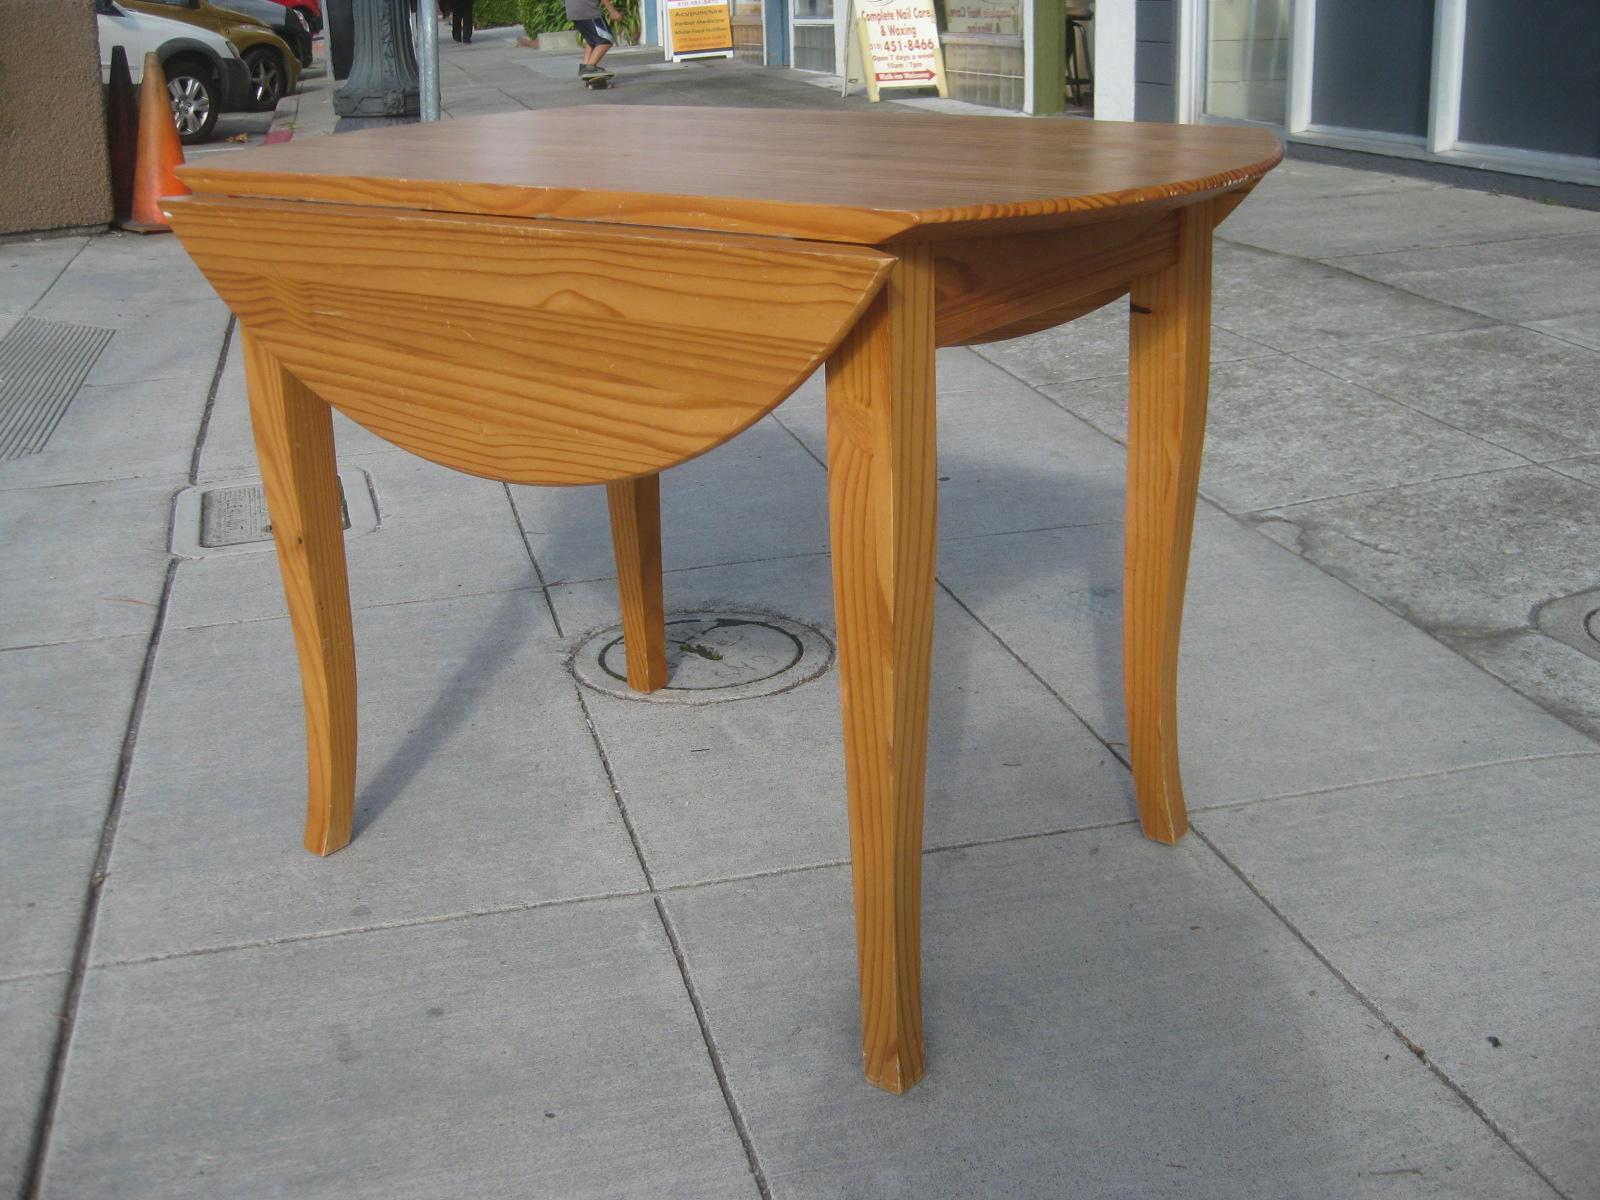 Sold Wooden Drop Leaf Table 100